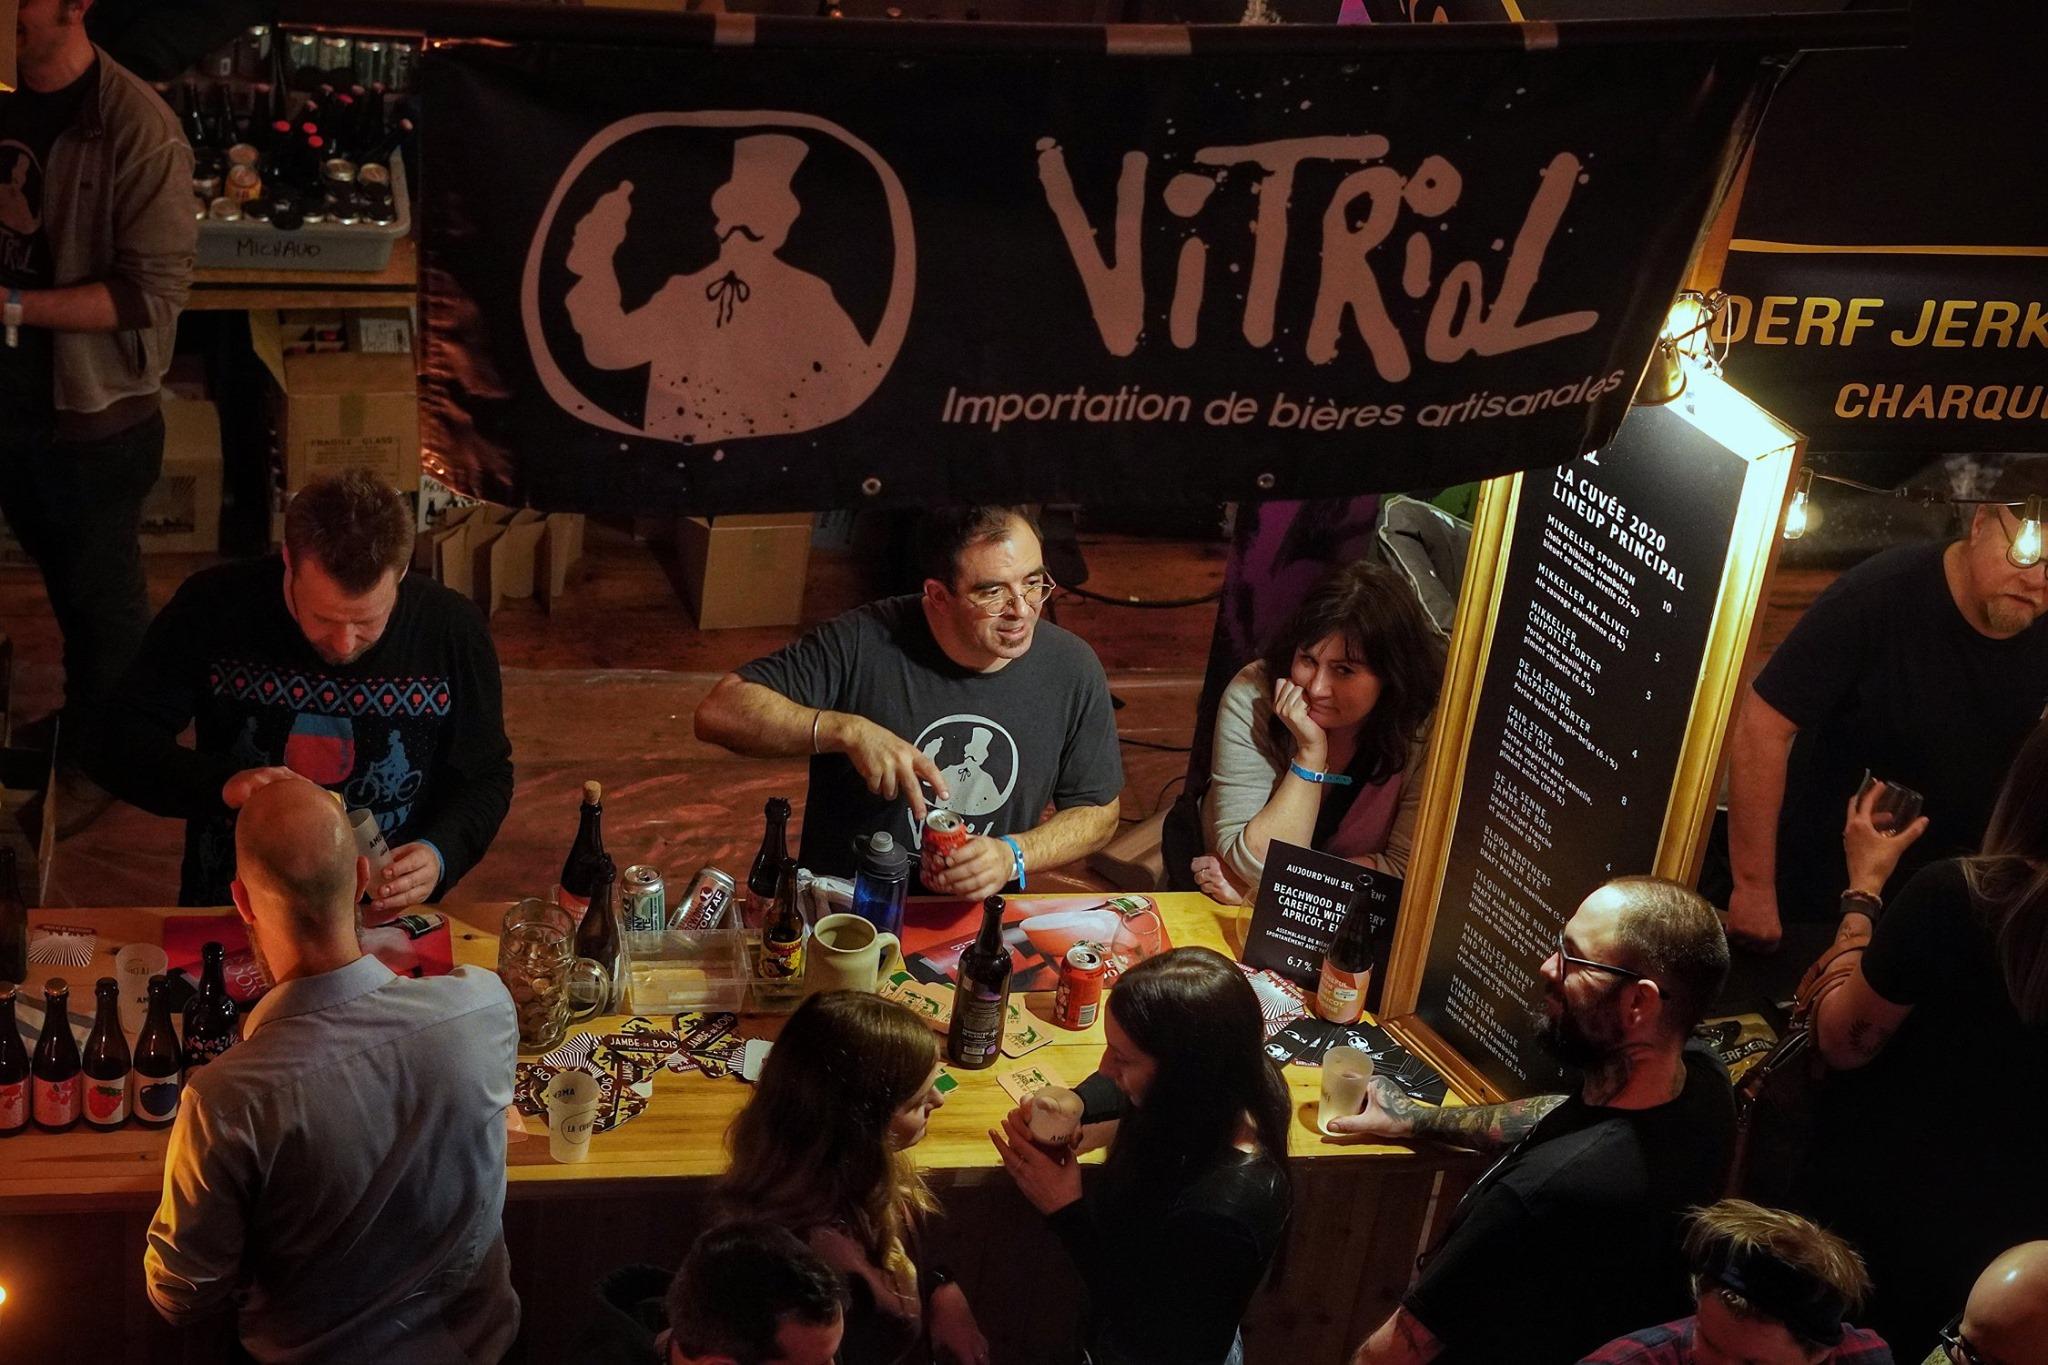 Agence-vitriol-event